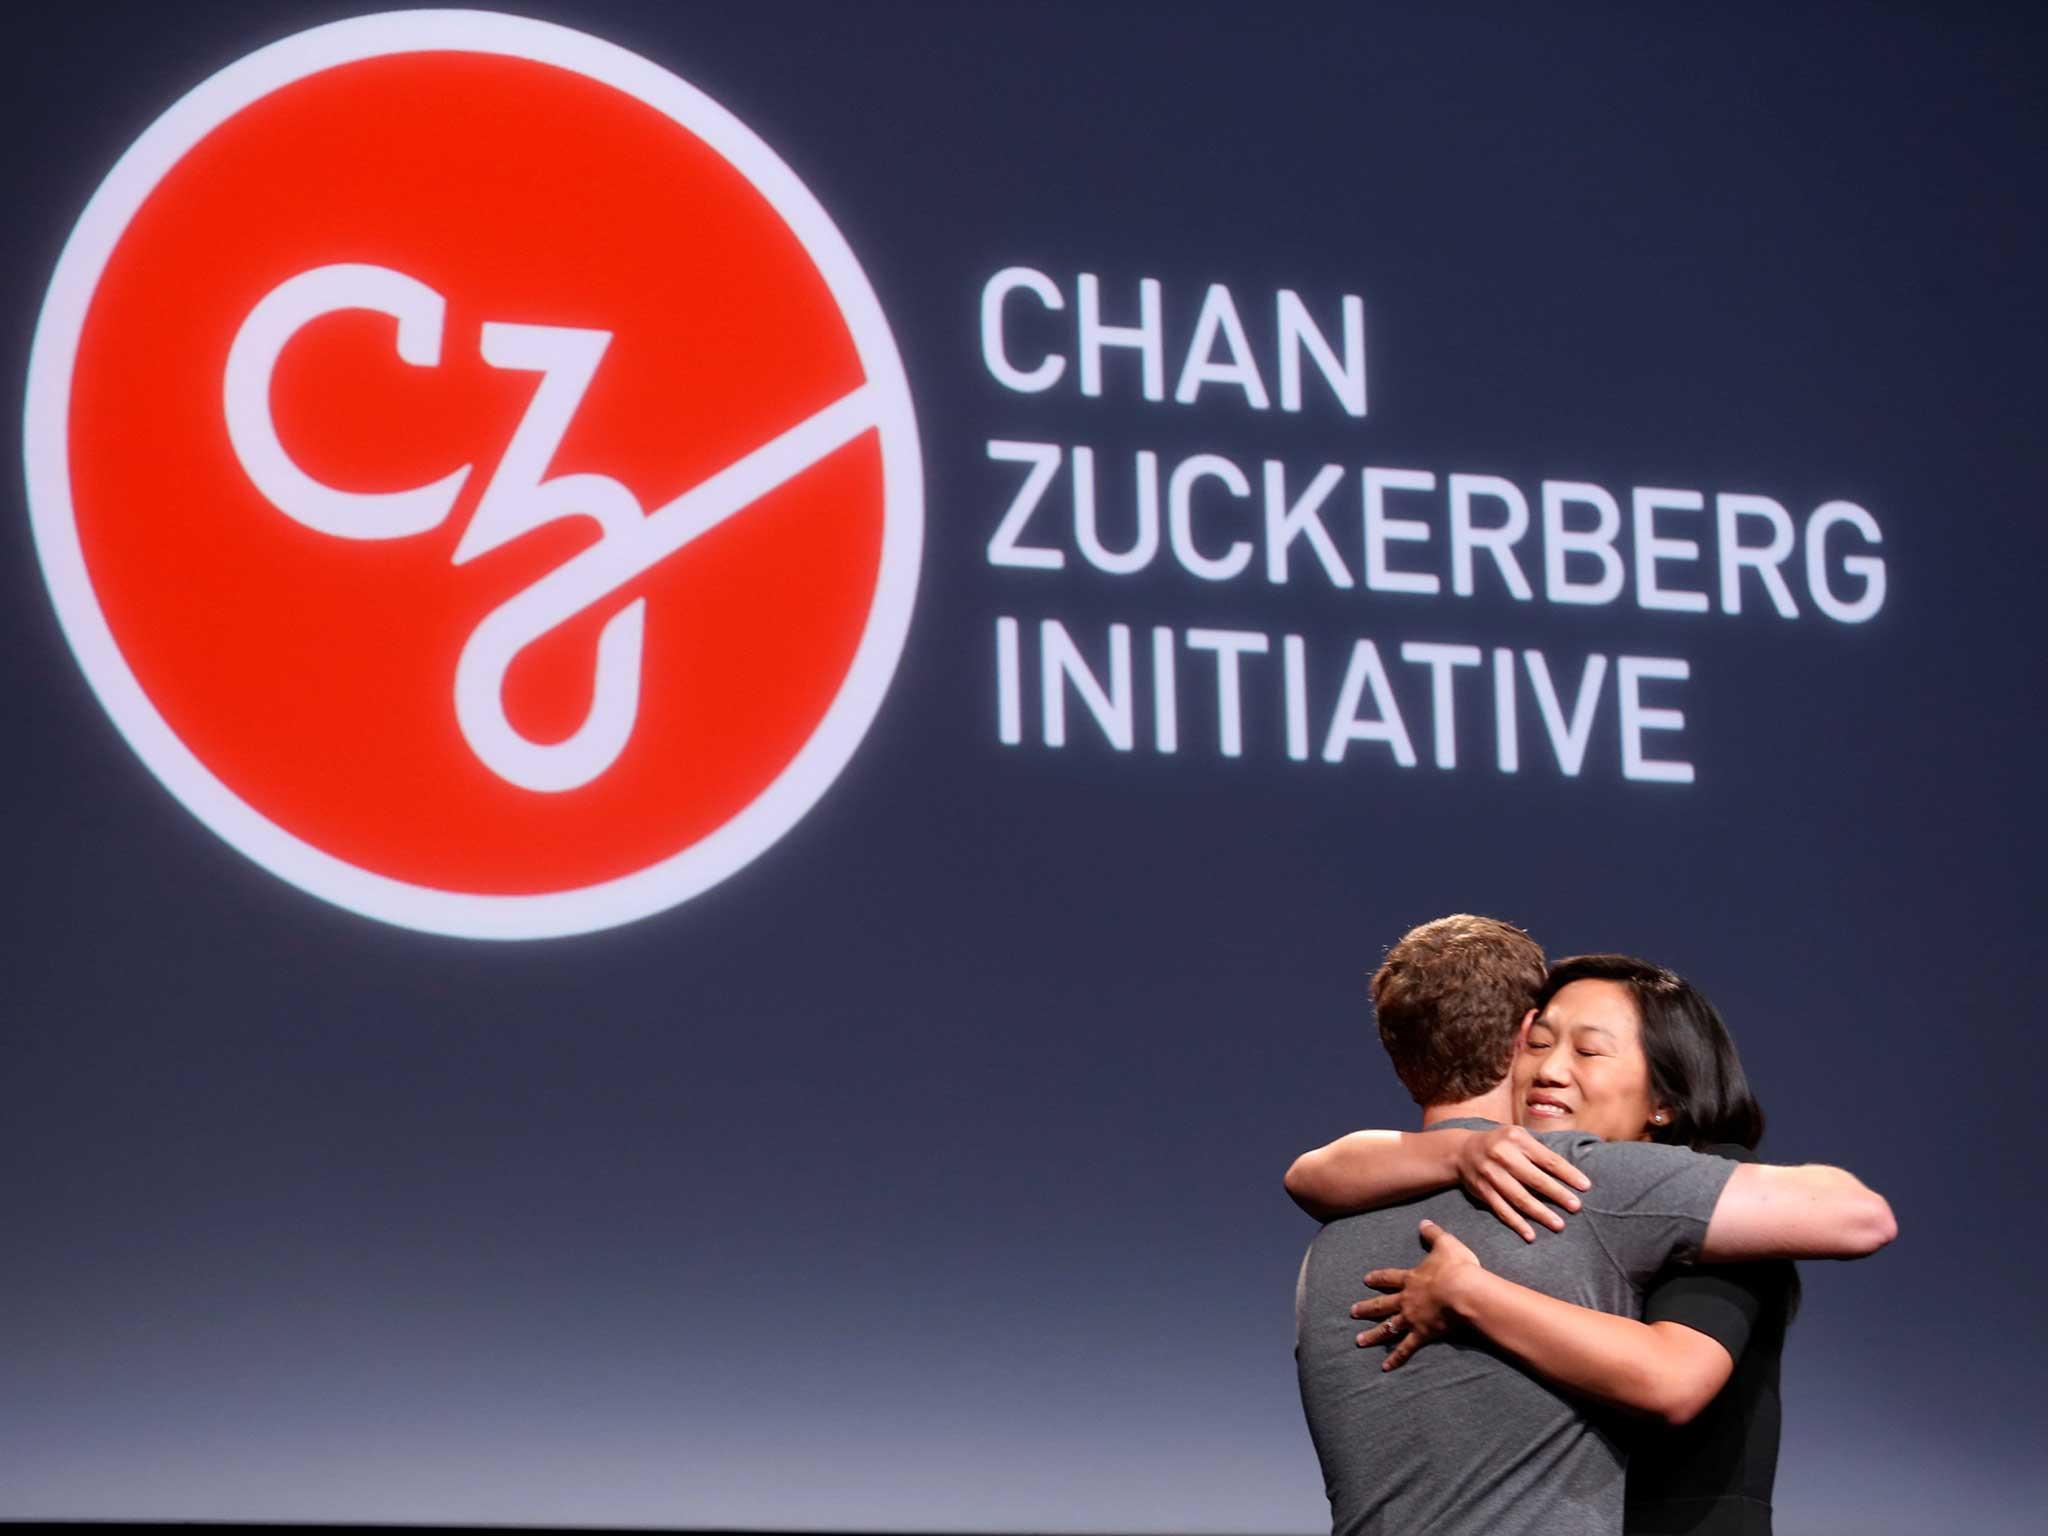 Chan Zuckerberg Initiative - Business Type: Non-profitFocus: Technology Training - G SuiteEngagement: Onsite Training / Consulting (Exec Admin Focused)